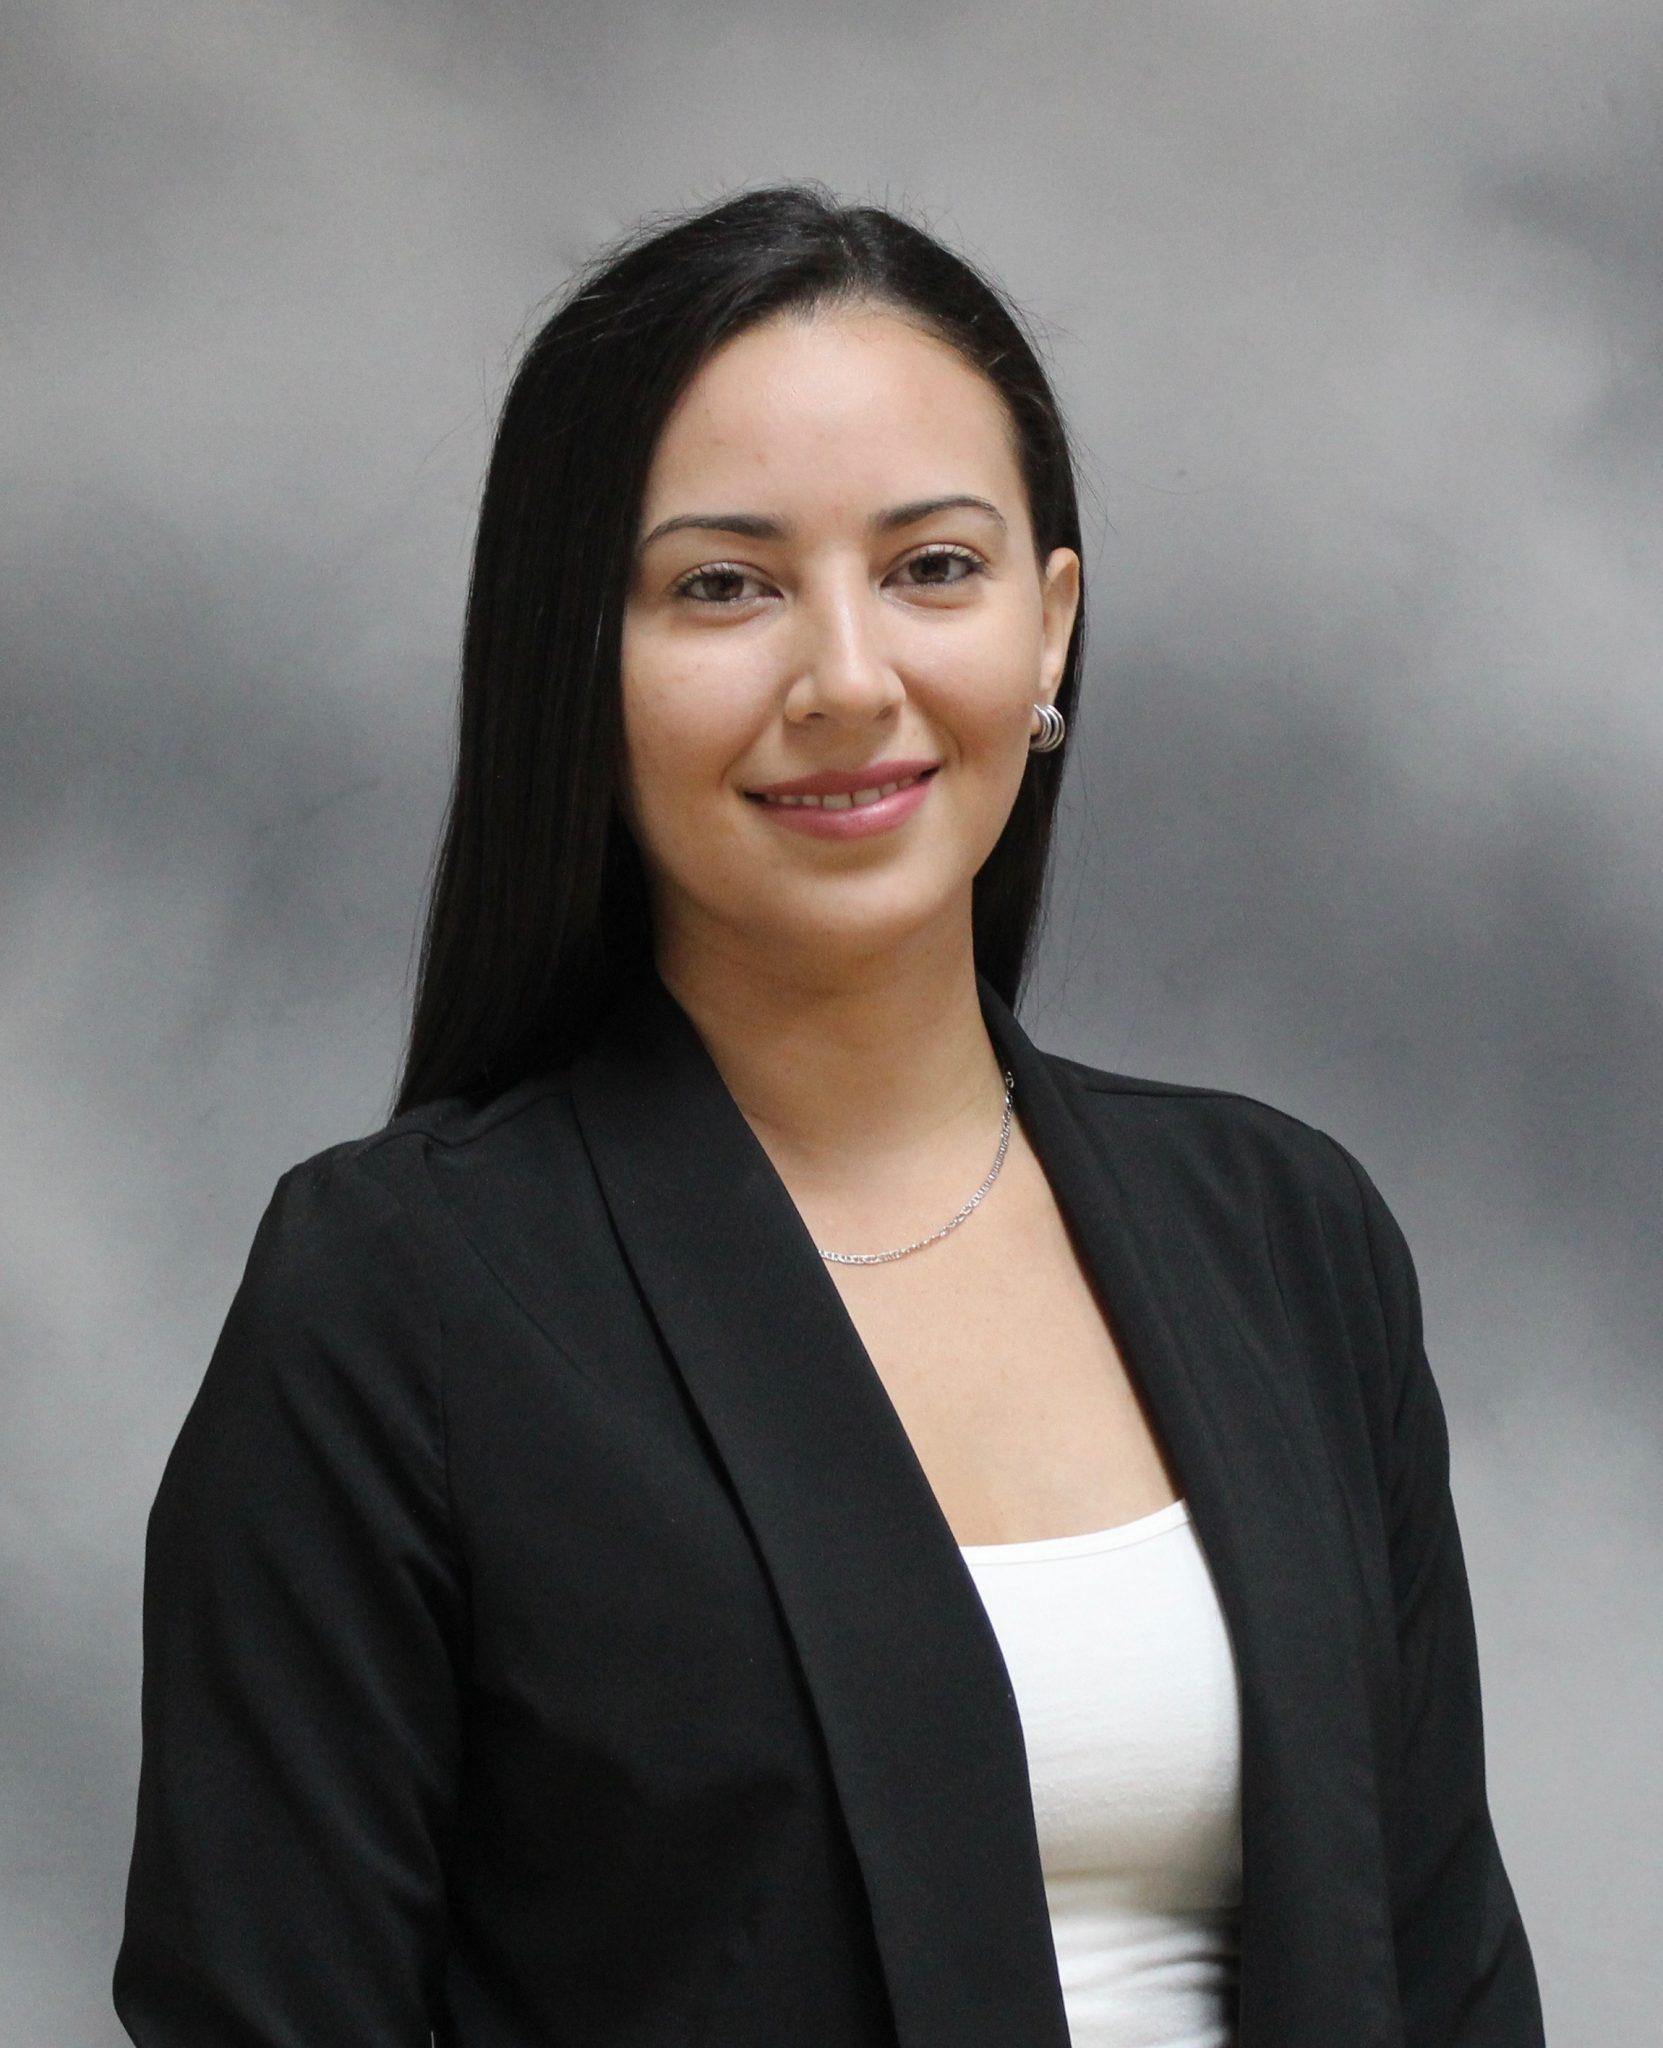 Sara Cameron Morales